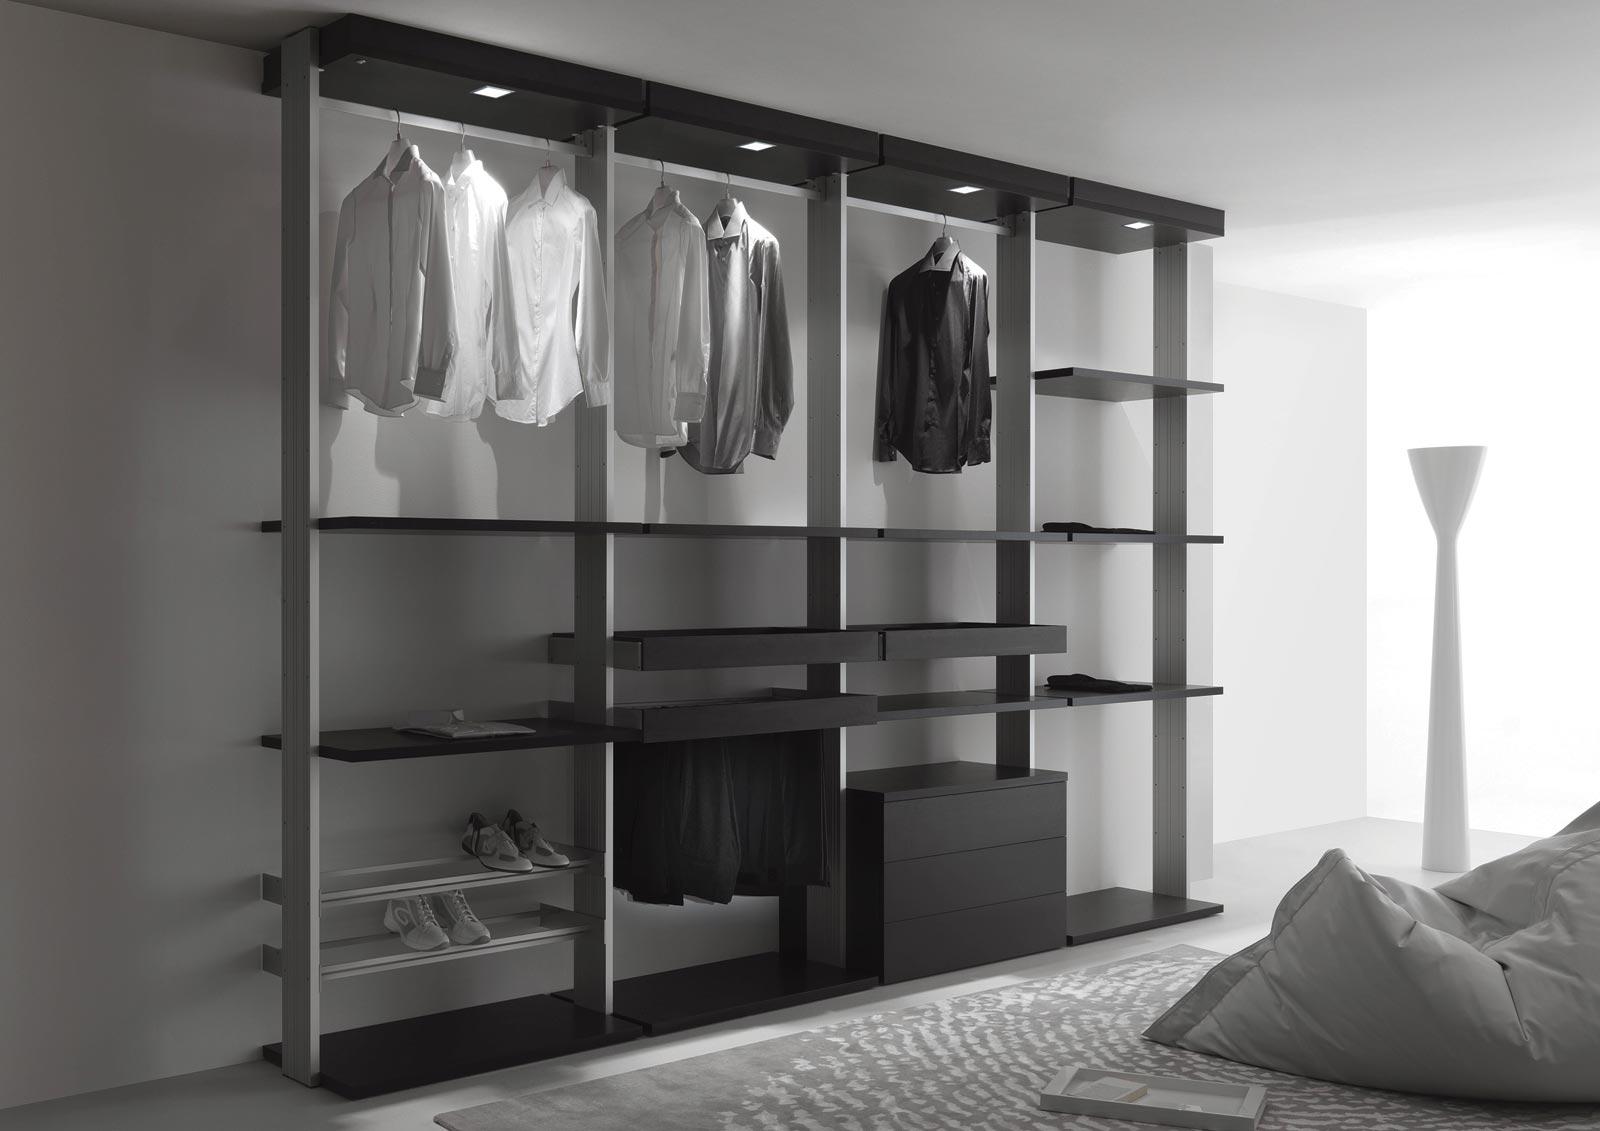 dressing besan on meuble penderie clairage vaissier. Black Bedroom Furniture Sets. Home Design Ideas